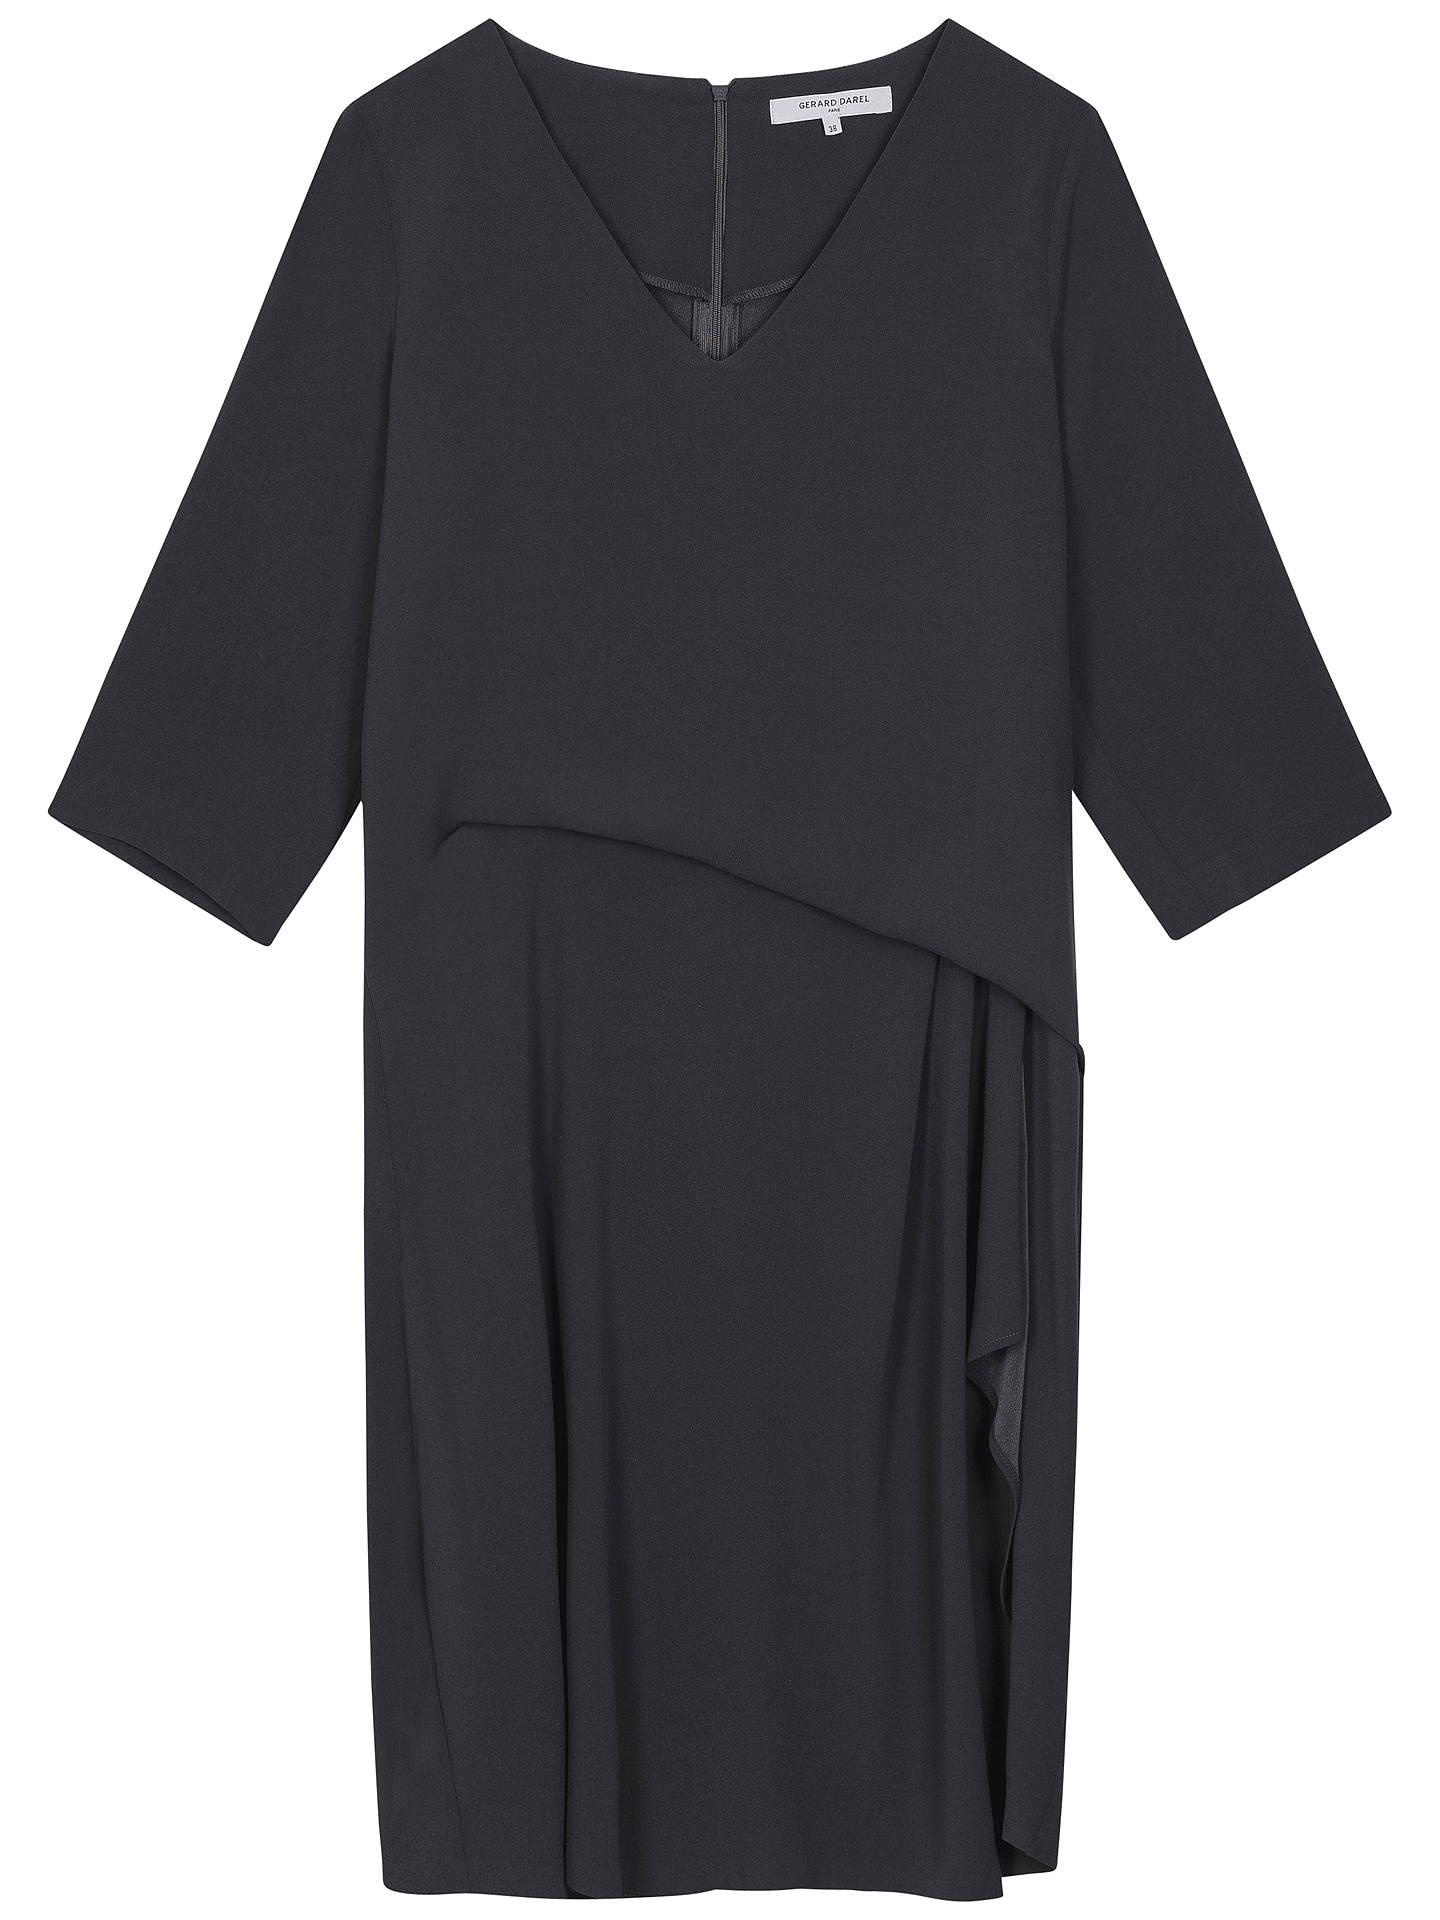 e07fdef57f1 Buy Gerard Darel Robe Dress